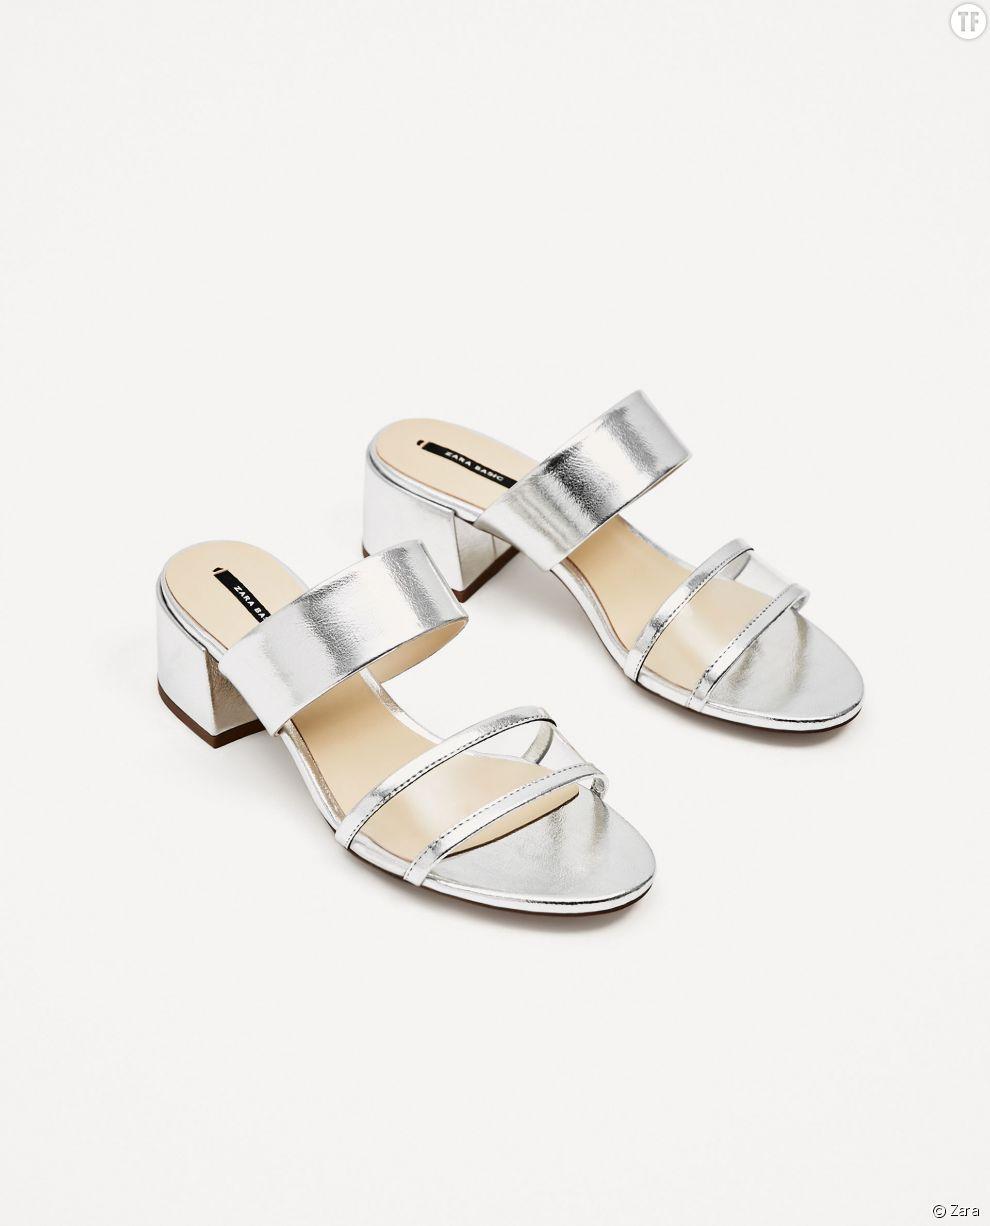 Mules argentées Zara, 12,99€